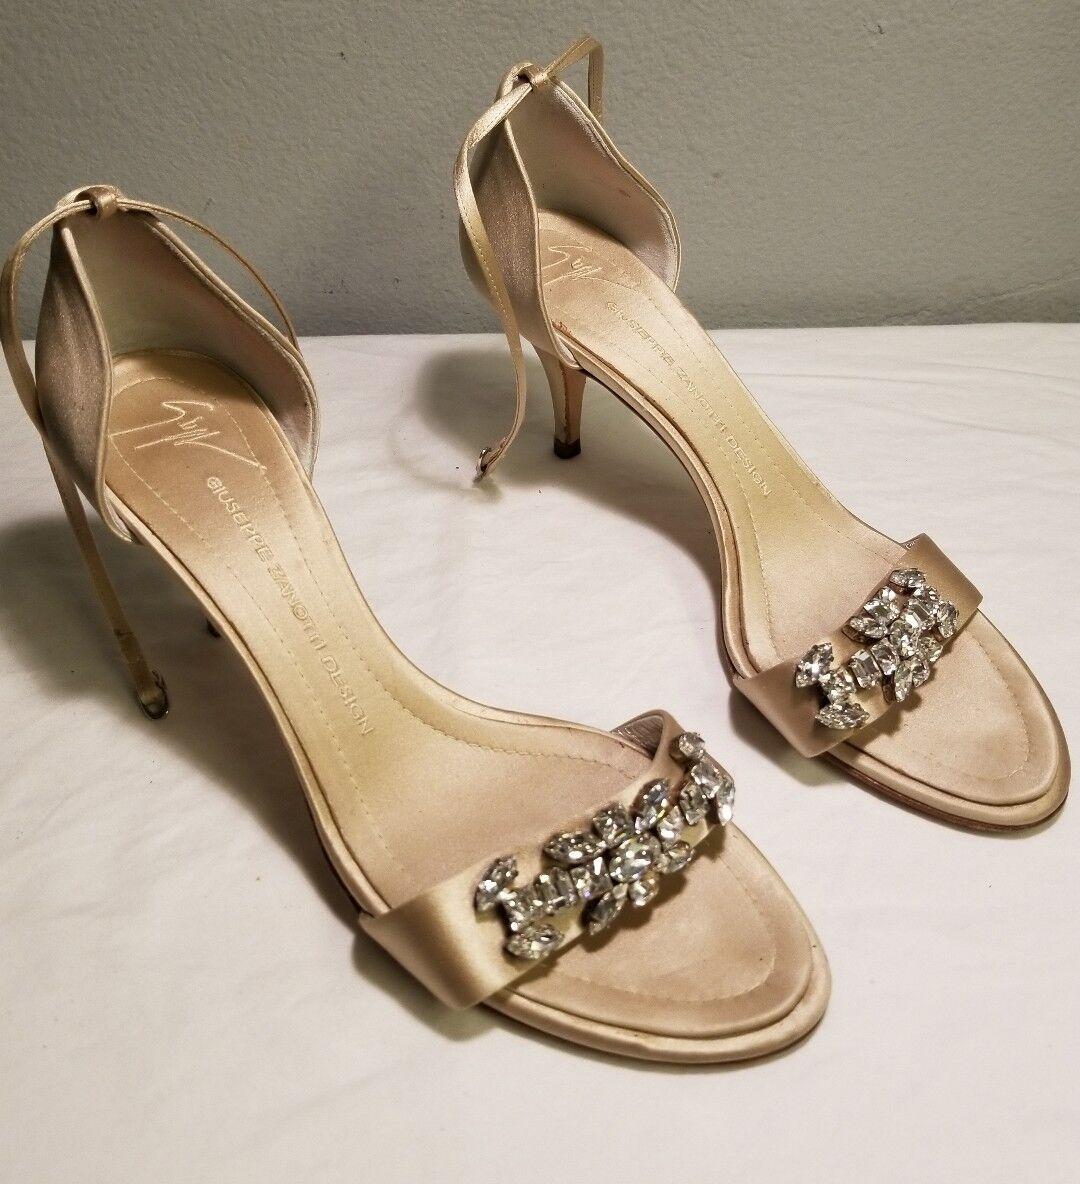 Giuseppe Zanotti Vicini satin Vero Cuoio Größe 40, 9.5 Jeweled Schuhes Heels